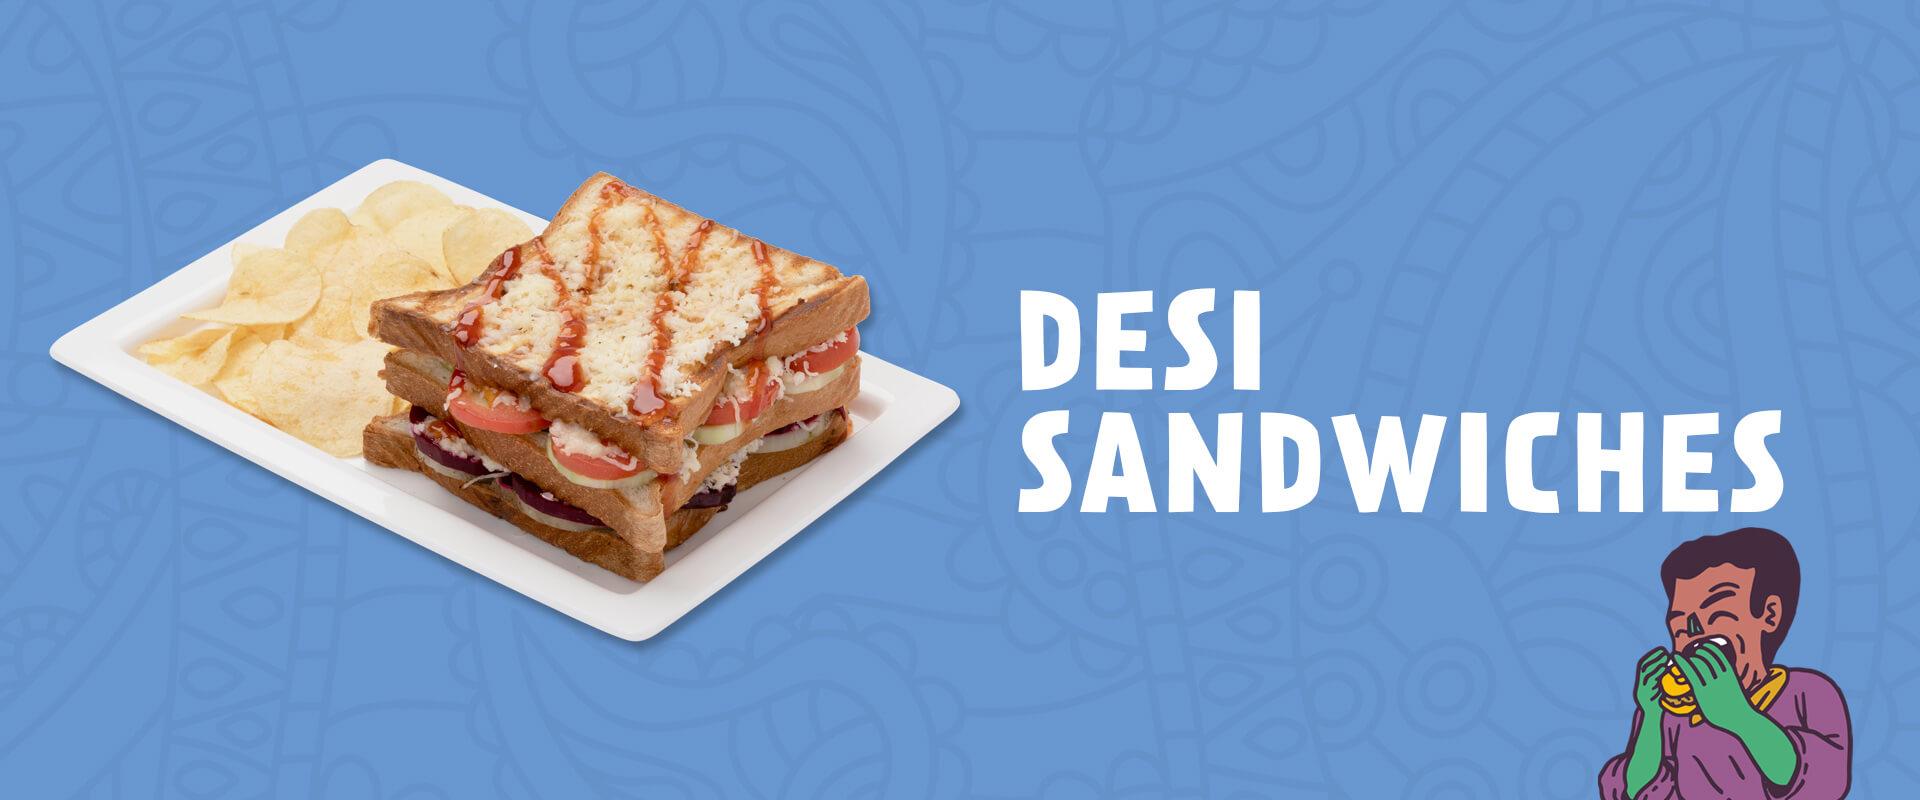 Desi Sandwiches menu at Neehee's